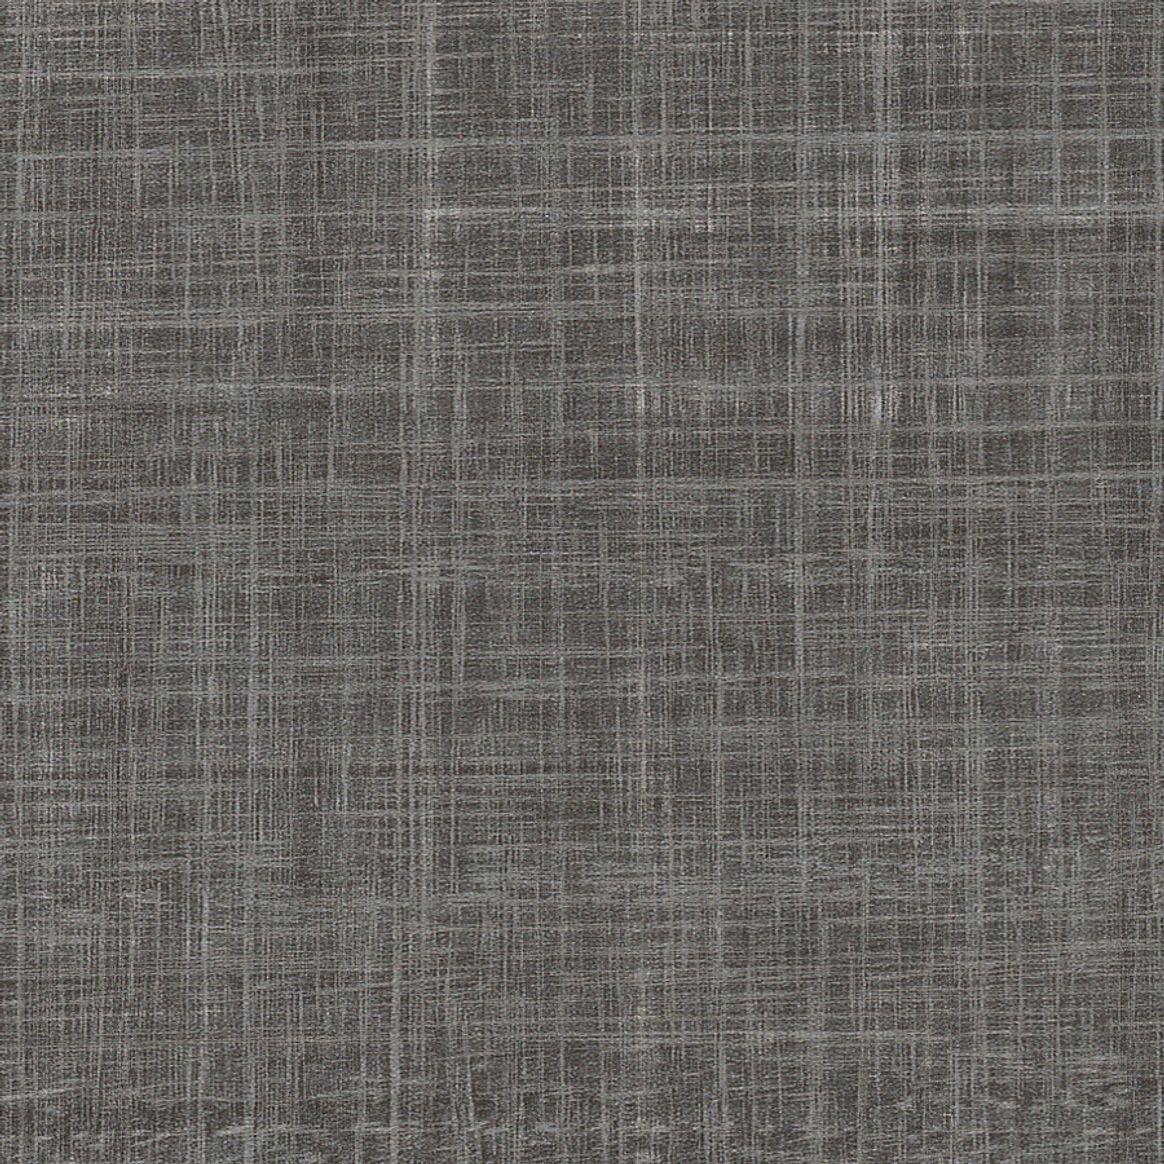 Satin Weave tile